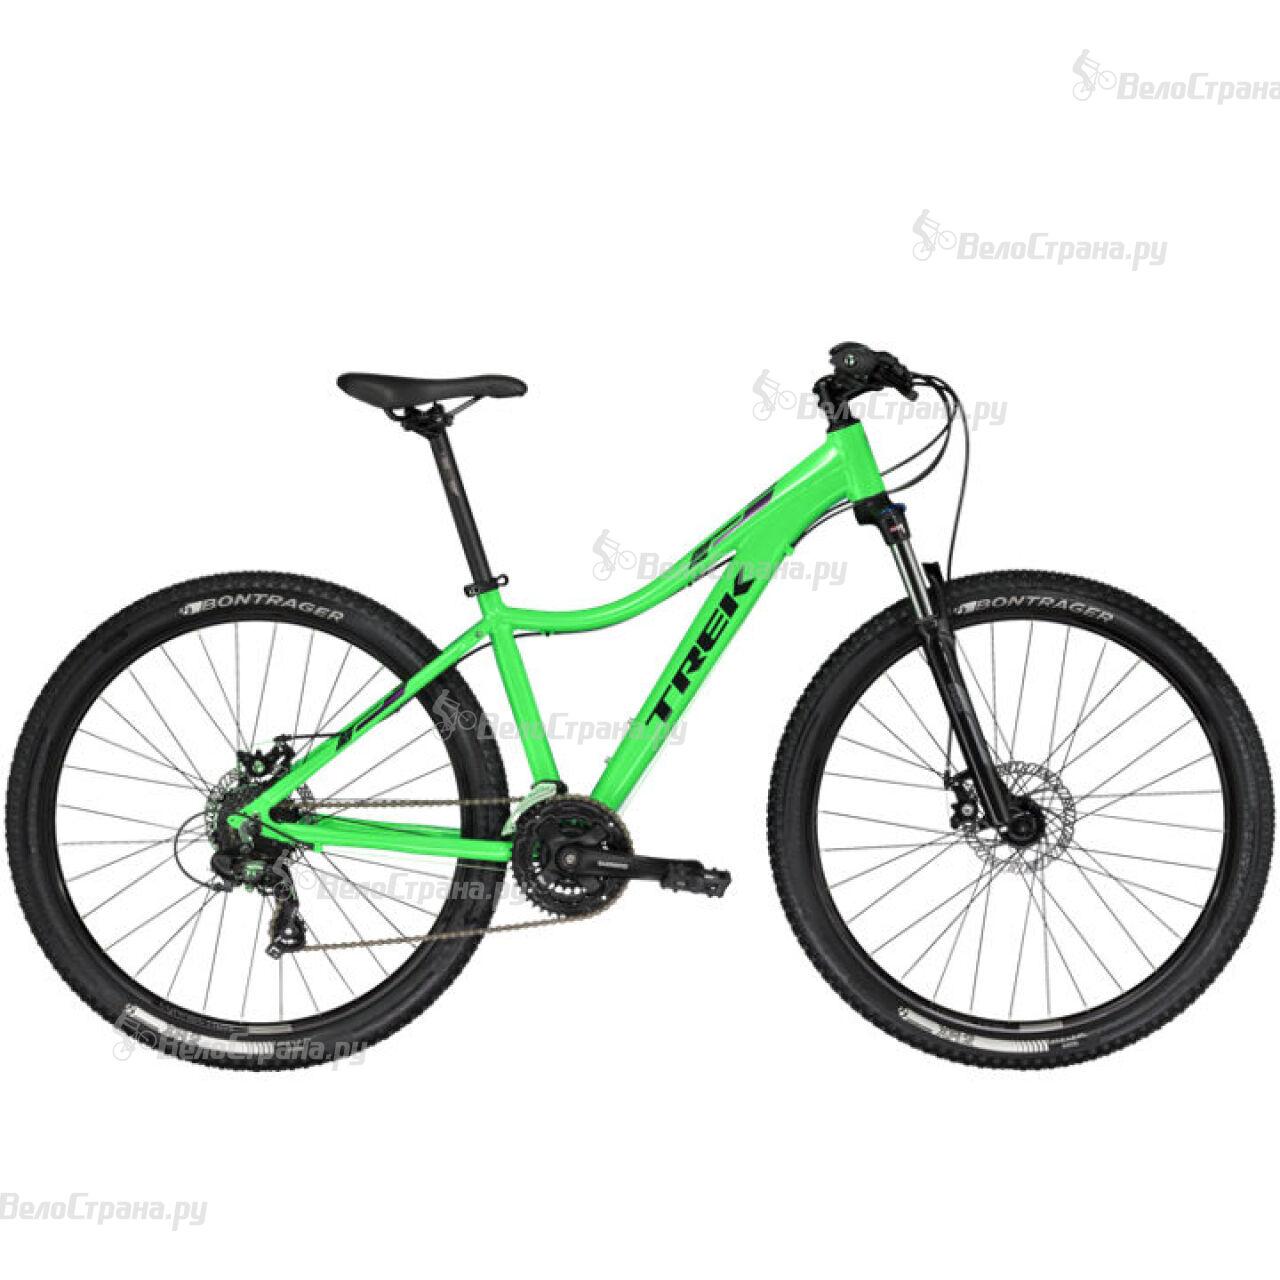 Велосипед Trek Skye S WSD 27,5 (2017) велосипед trek madone 3 1 wsd 2013